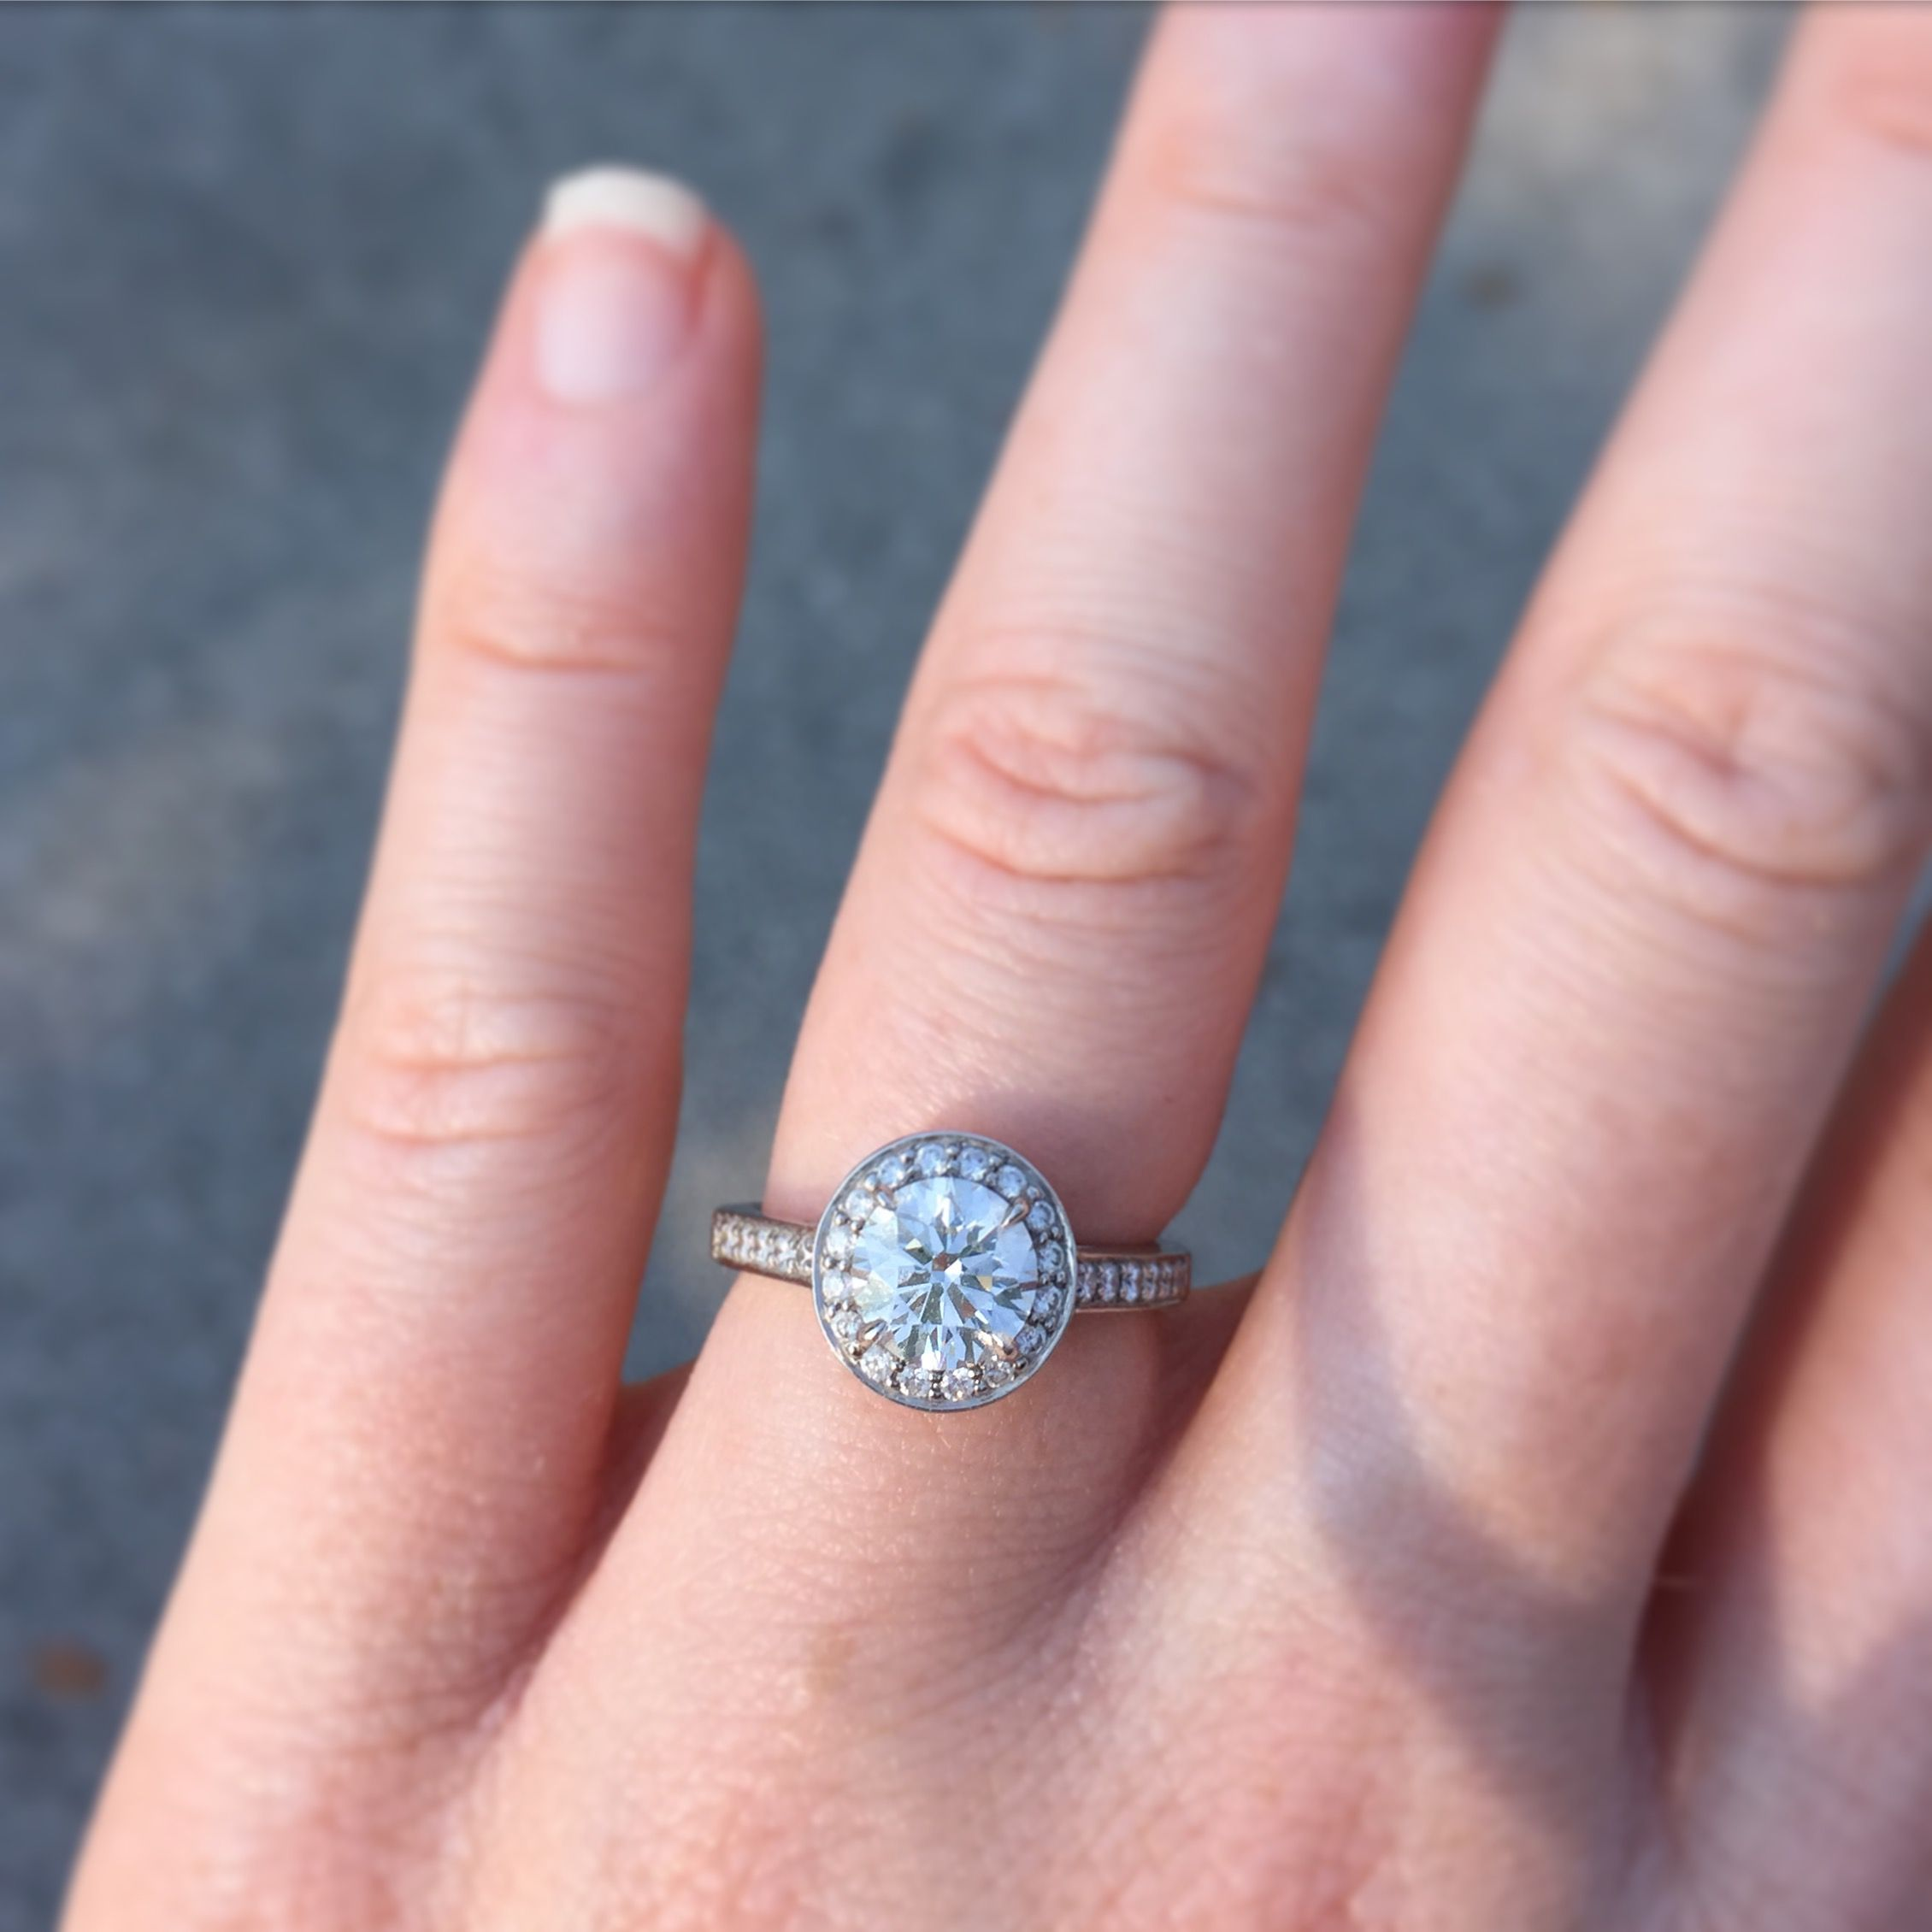 Tiffany Embrace. Center stone: .92 carats, H, VVS2. Halo and band ...